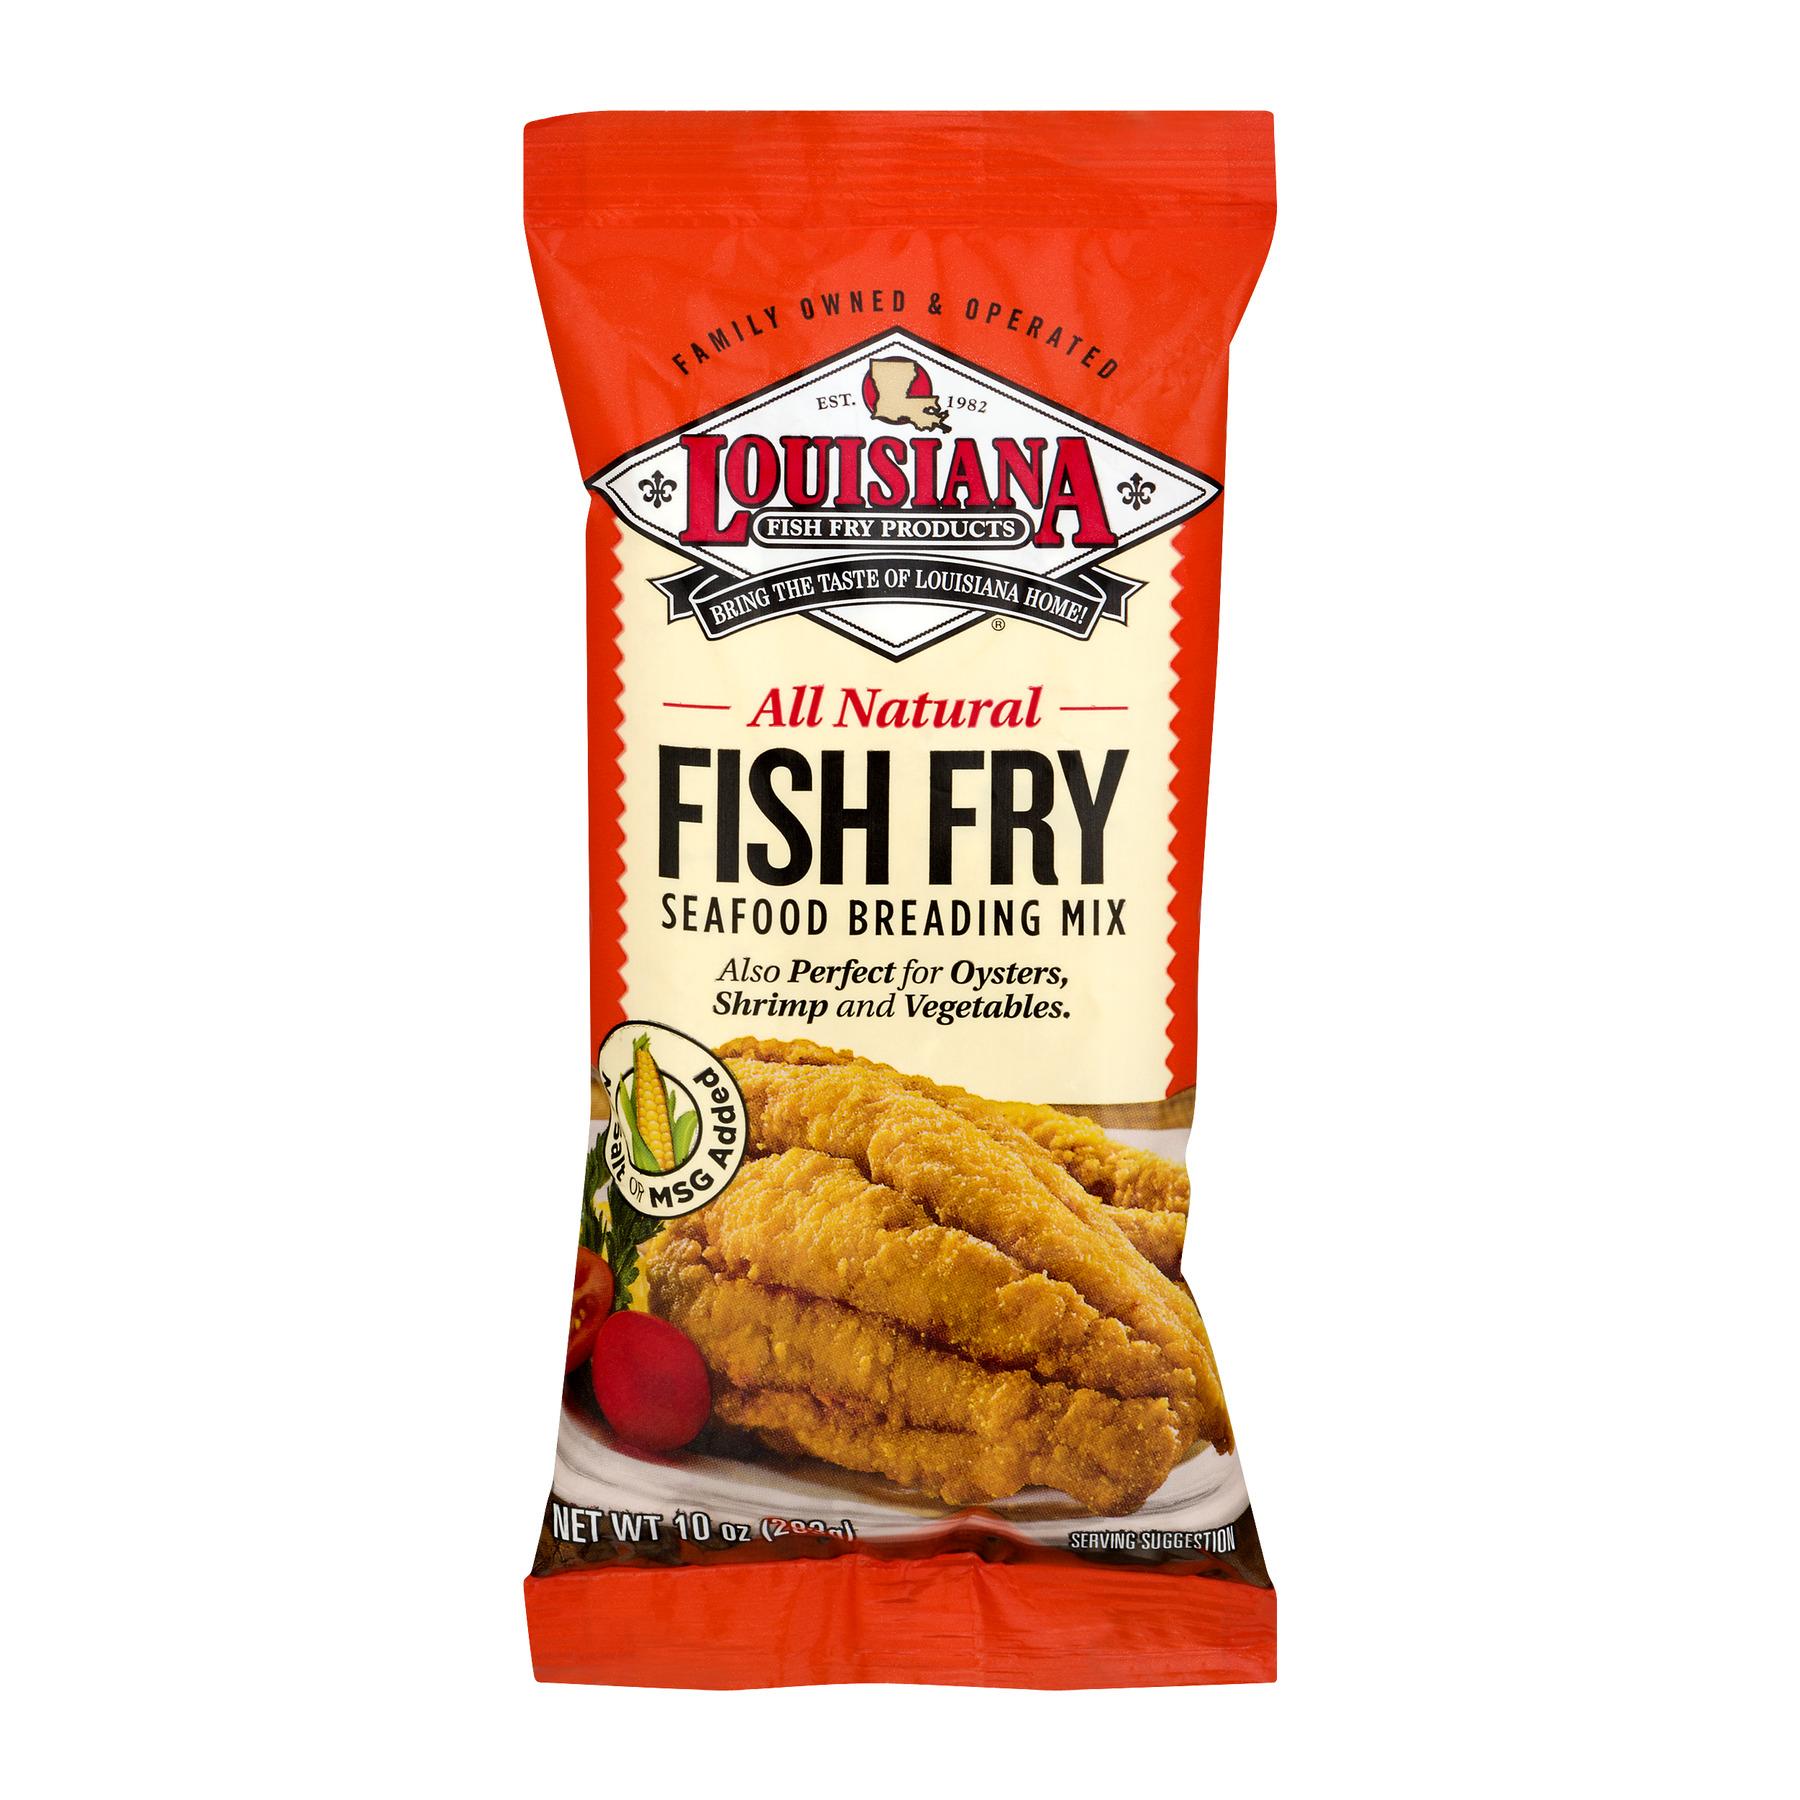 (3 Pack) Louisiana Unseasoned Fish Fry Seafood Breading Mix, 10 oz